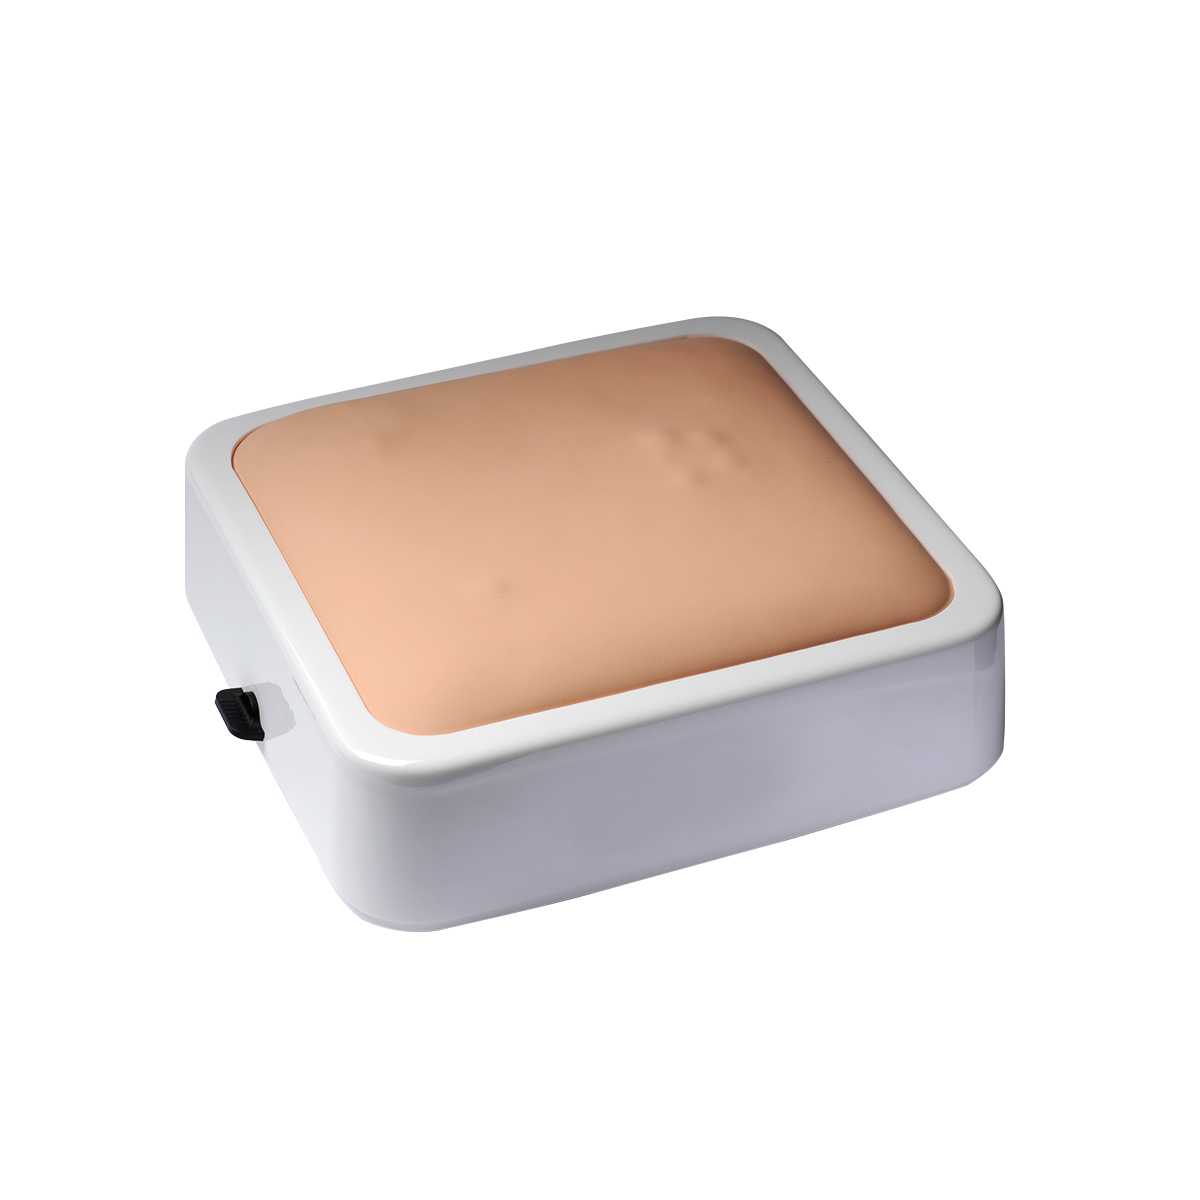 Lumps and Bumps Box - 1005164 - W19345 - LBB100